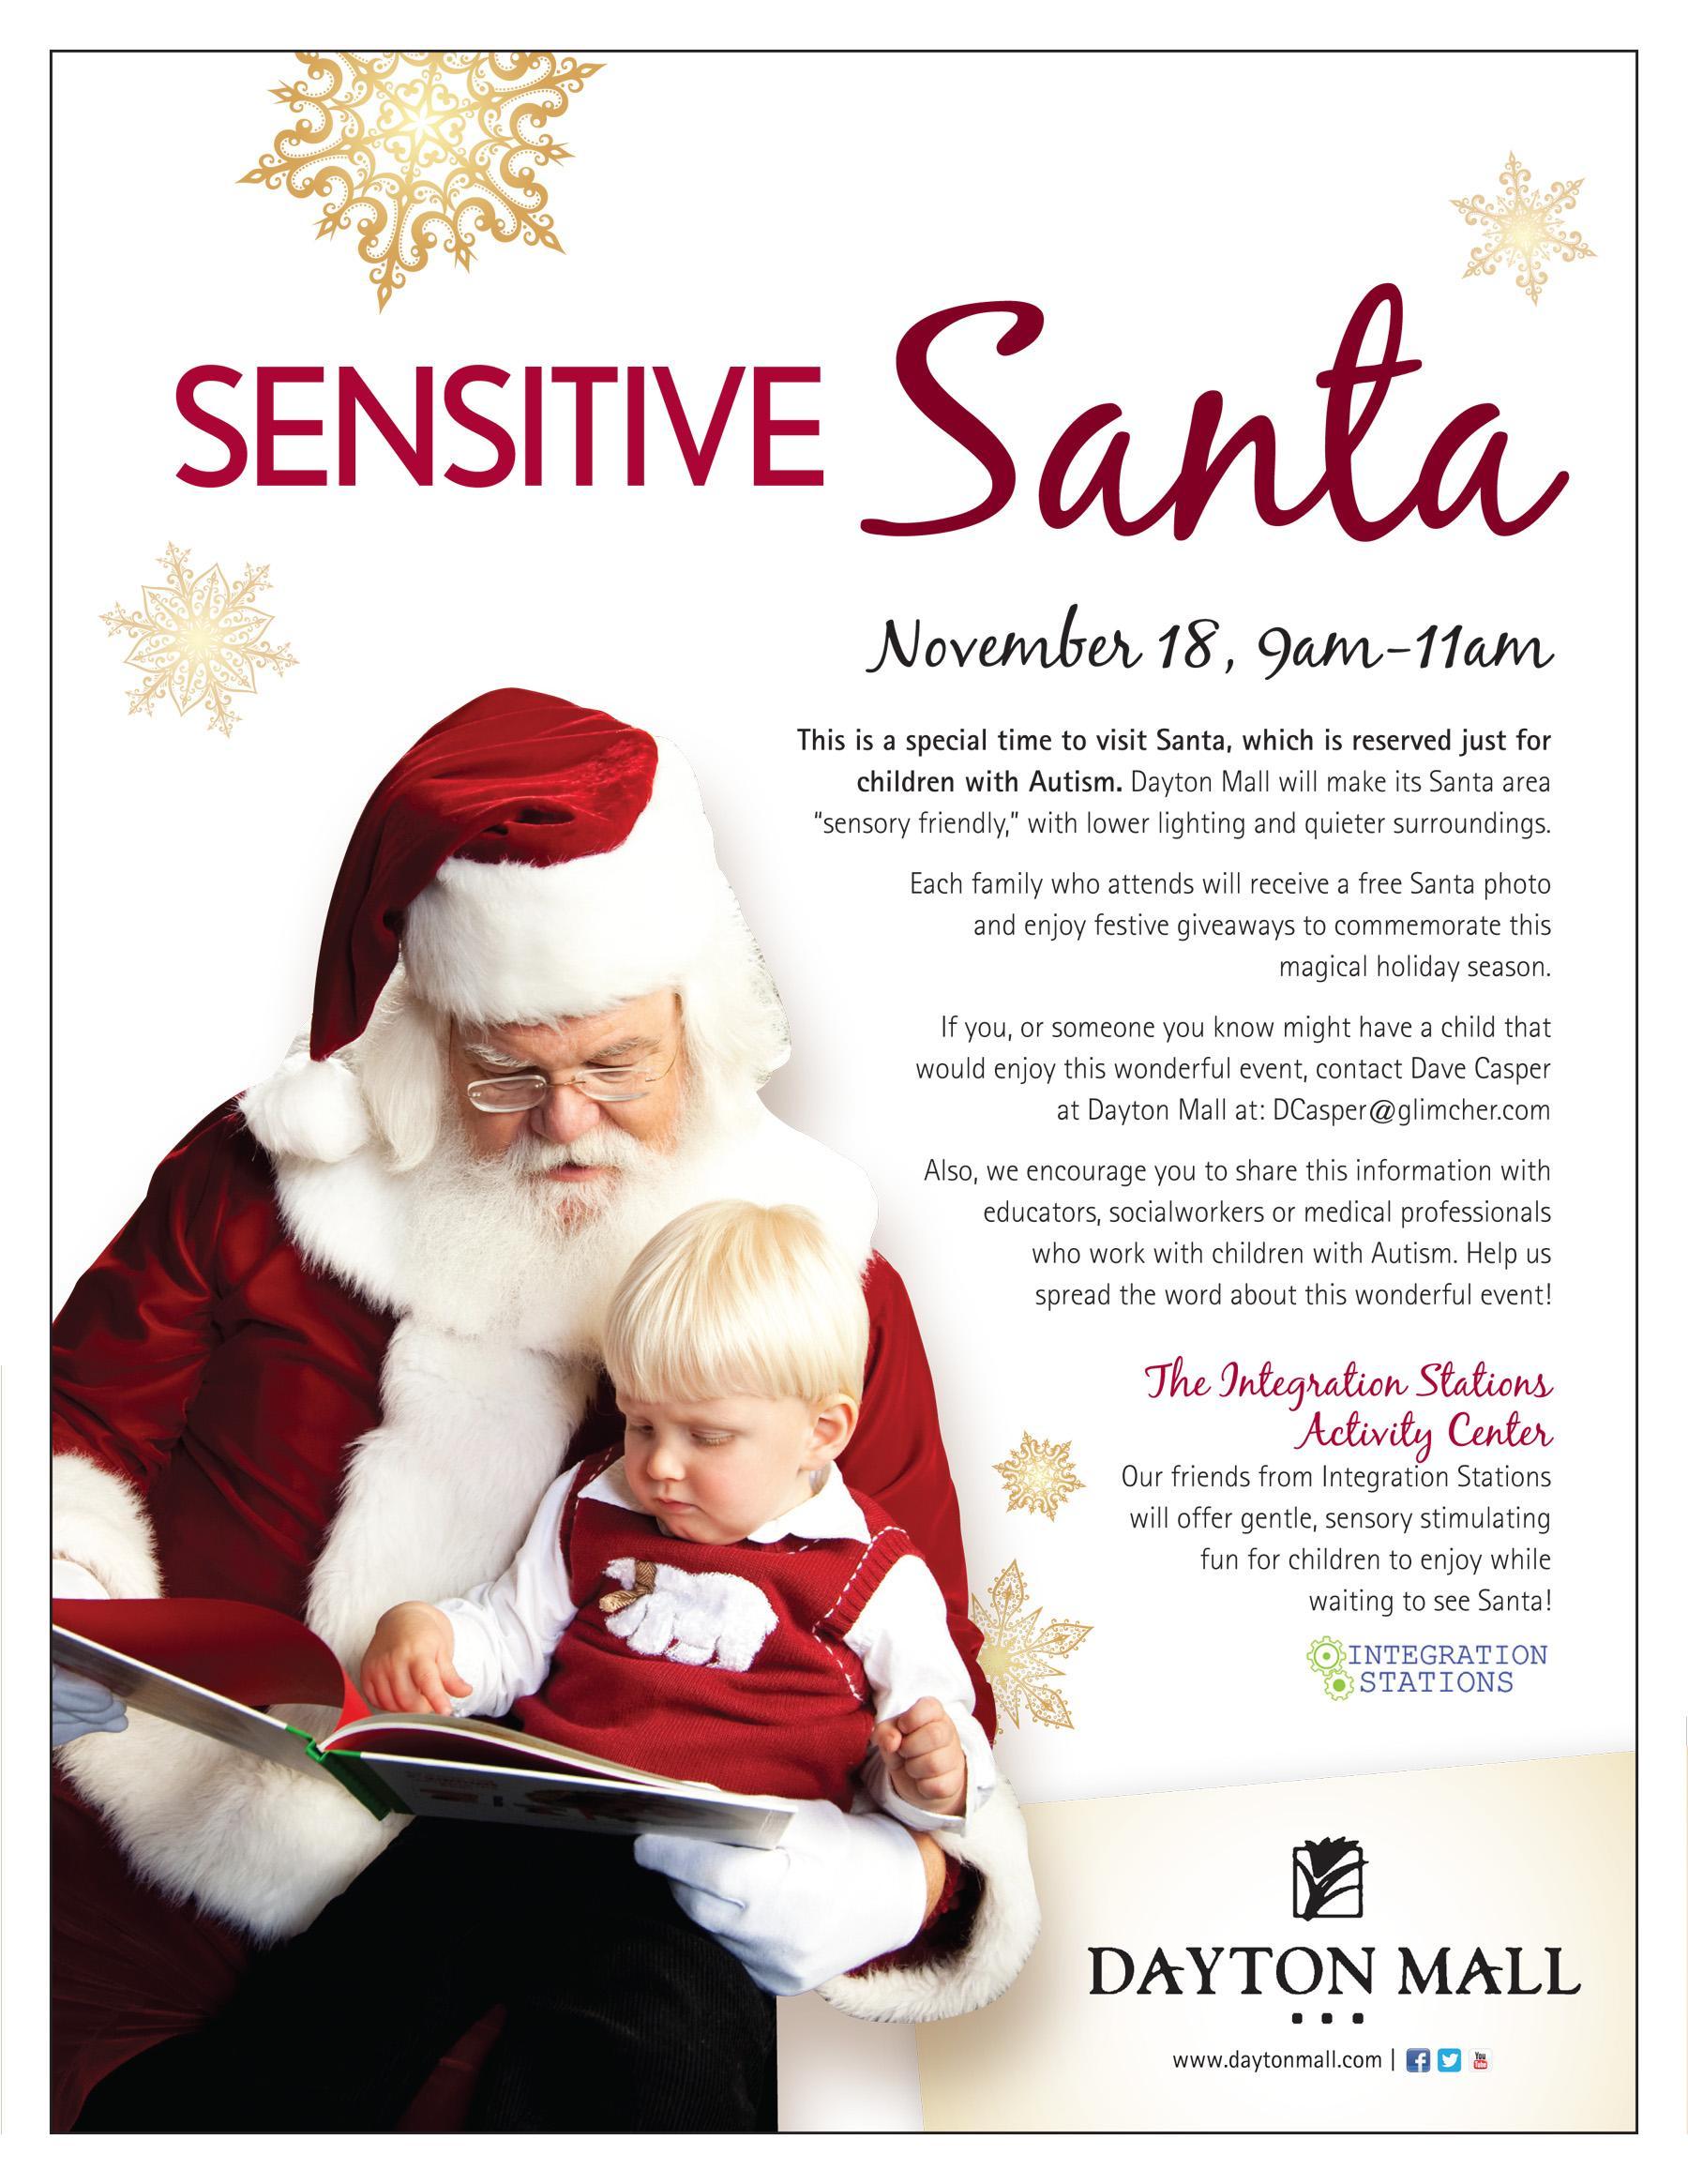 Sensitive Santa brightens holidays for autistic children | WVXU